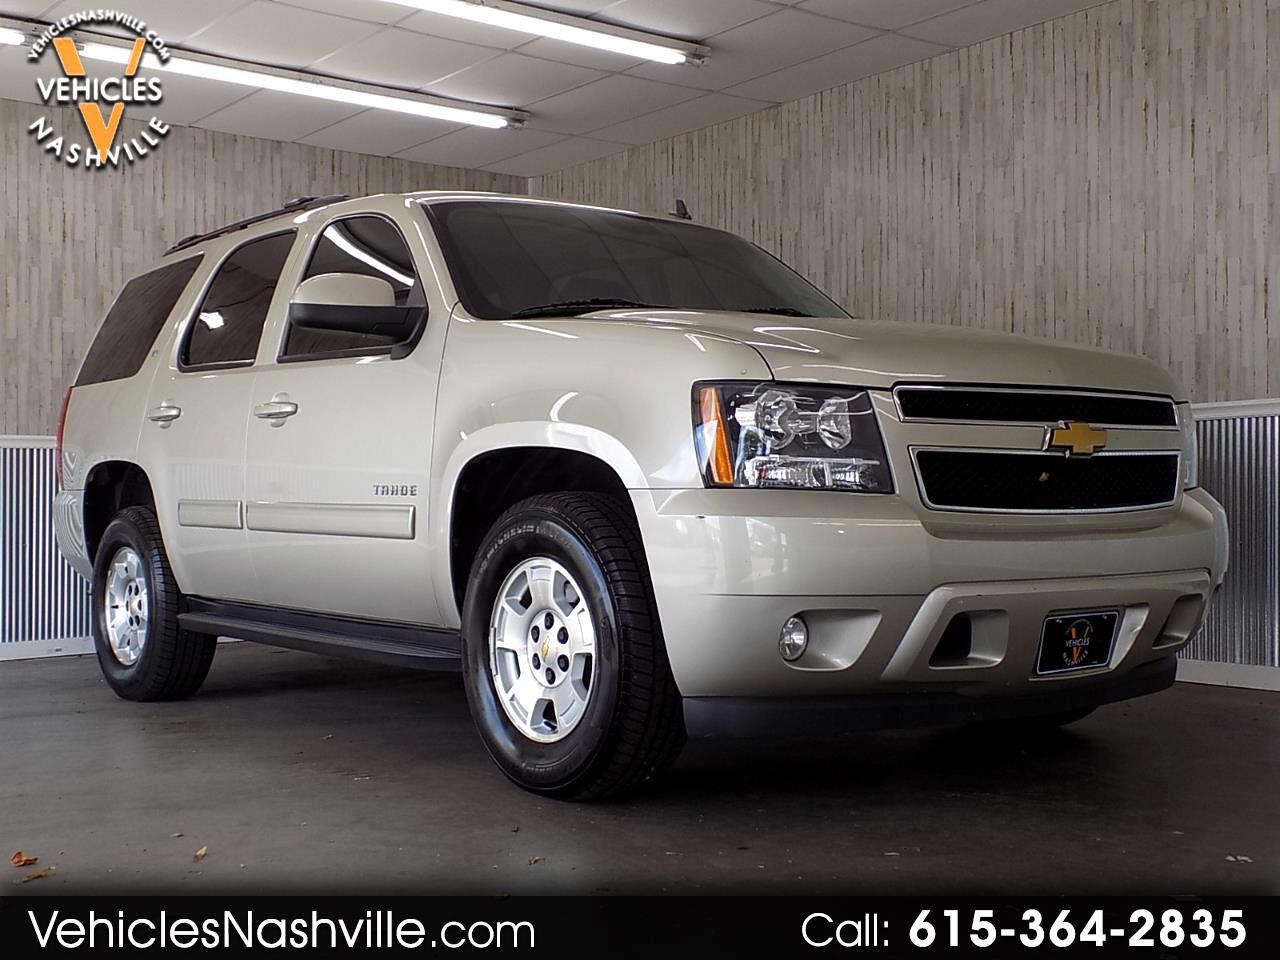 2013 Chevrolet Tahoe 2WD 4dr LT